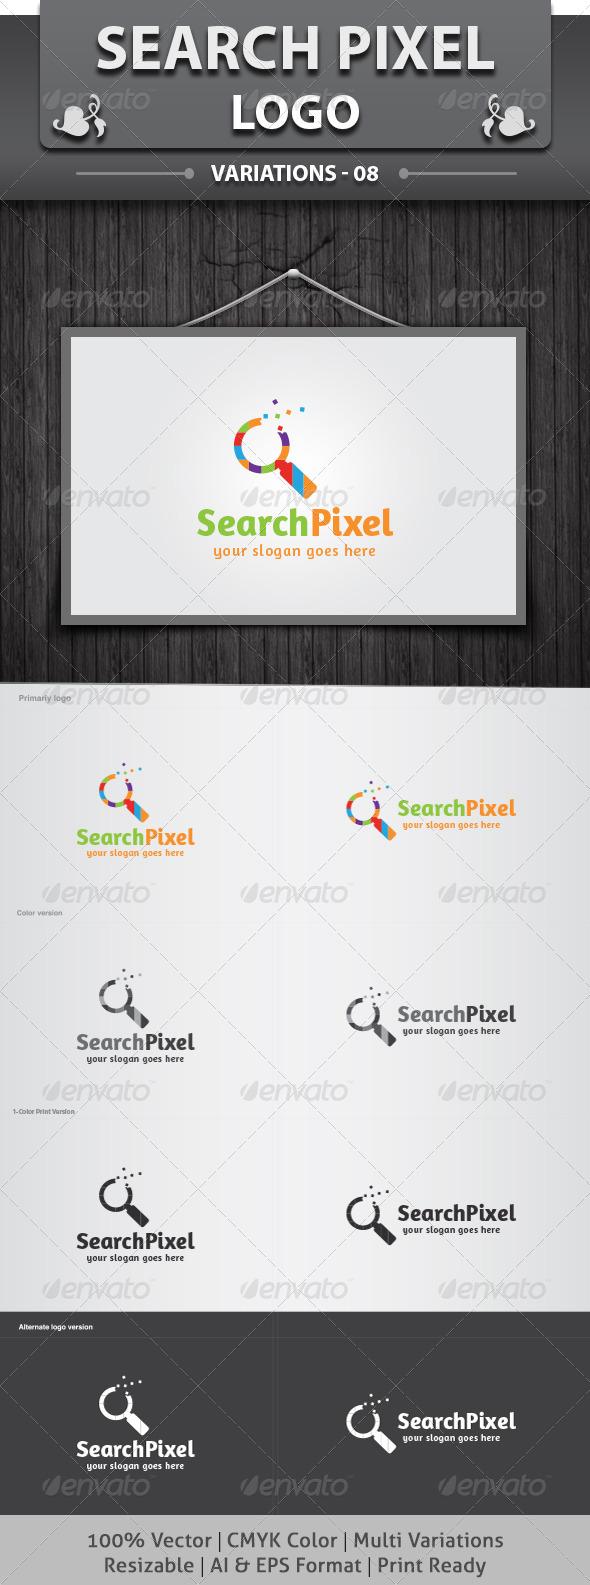 GraphicRiver Search Pixel Logo 6084515